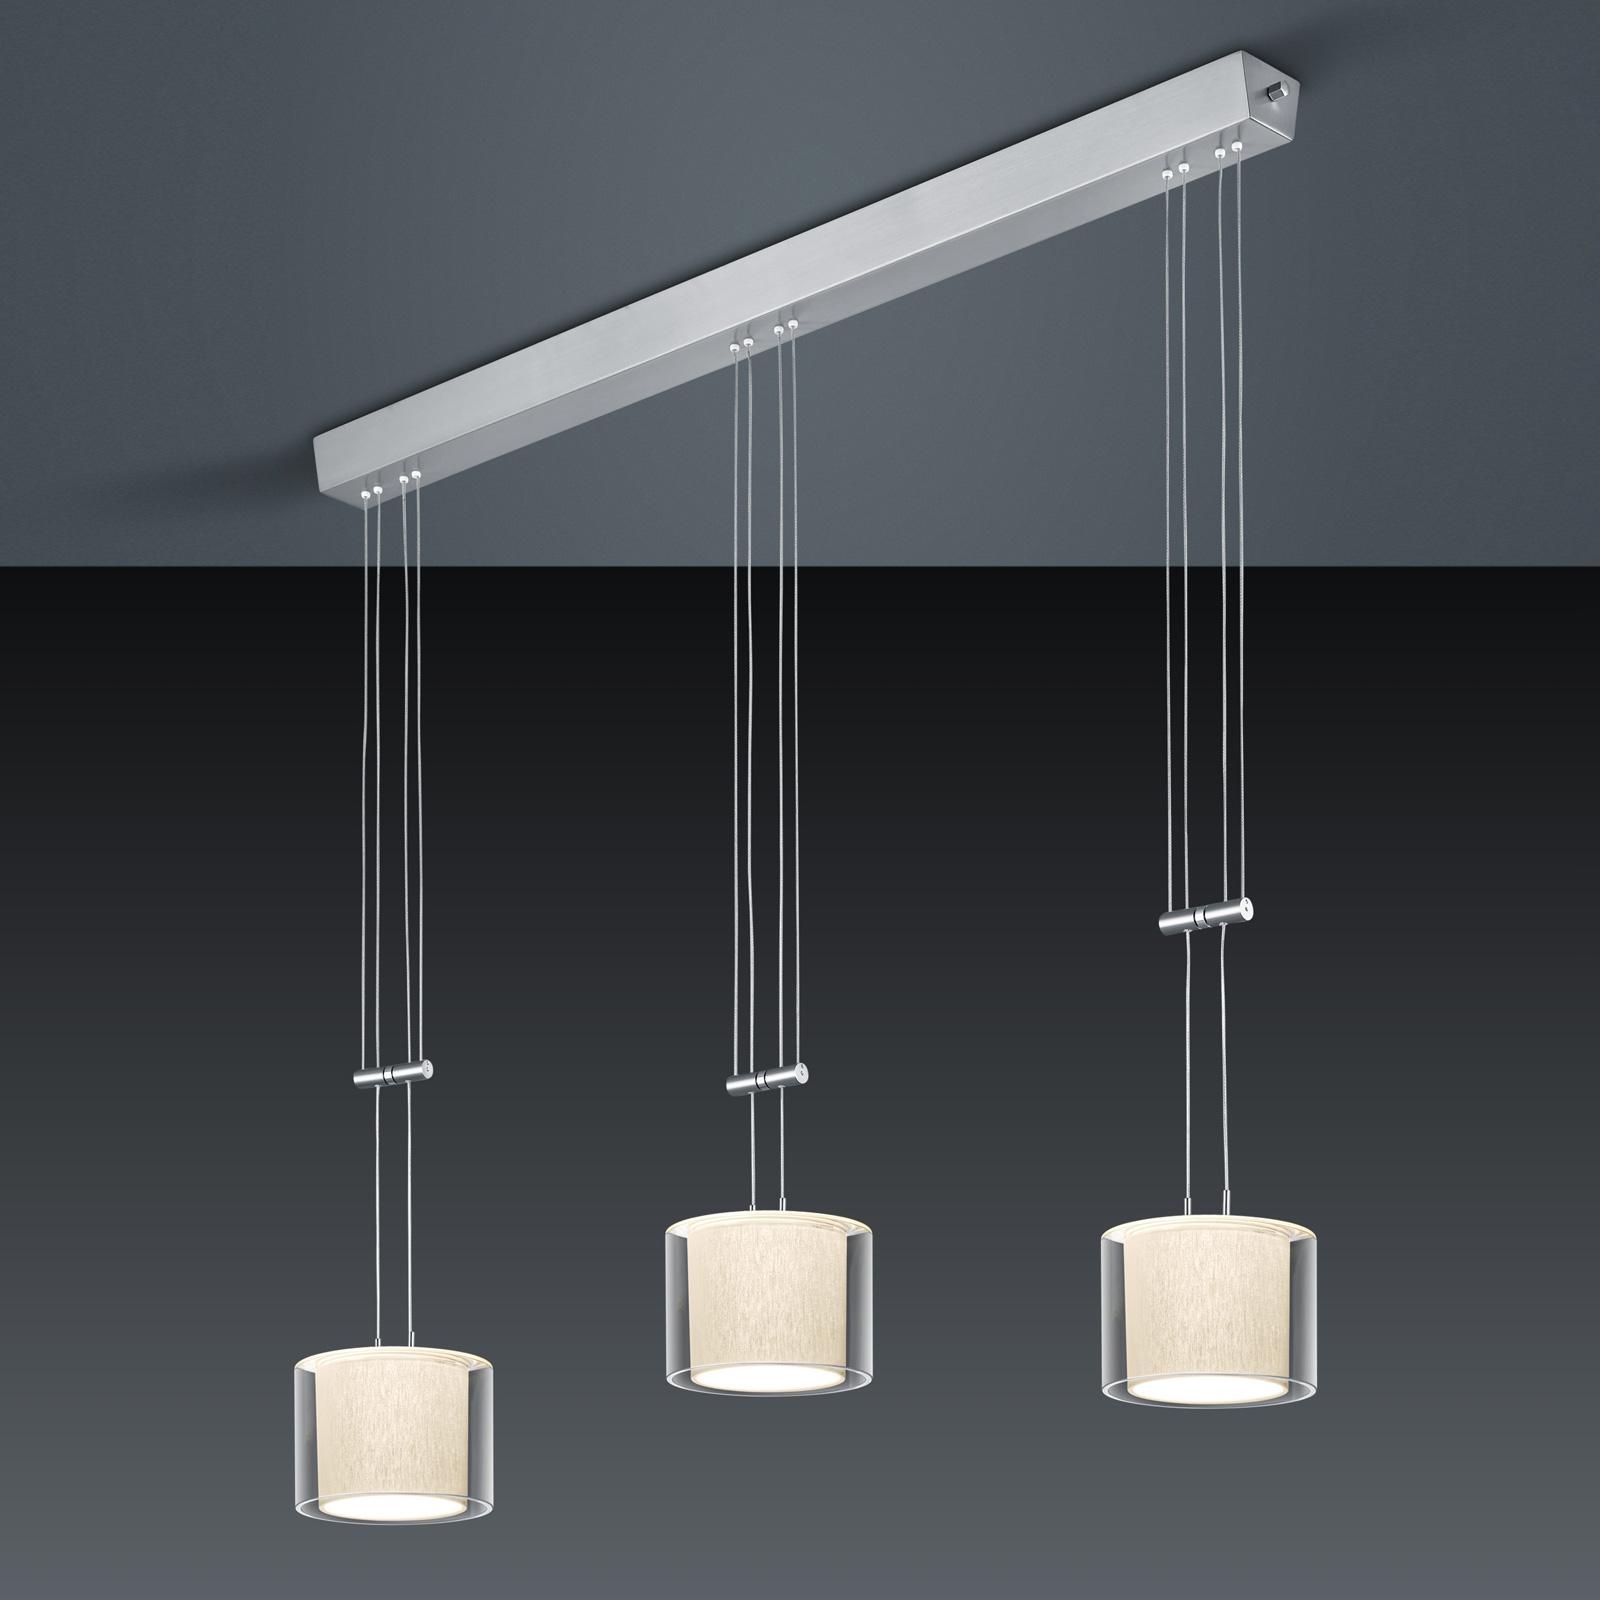 BANKAMP Cecil lampa wisząca LED, 3-punktowa